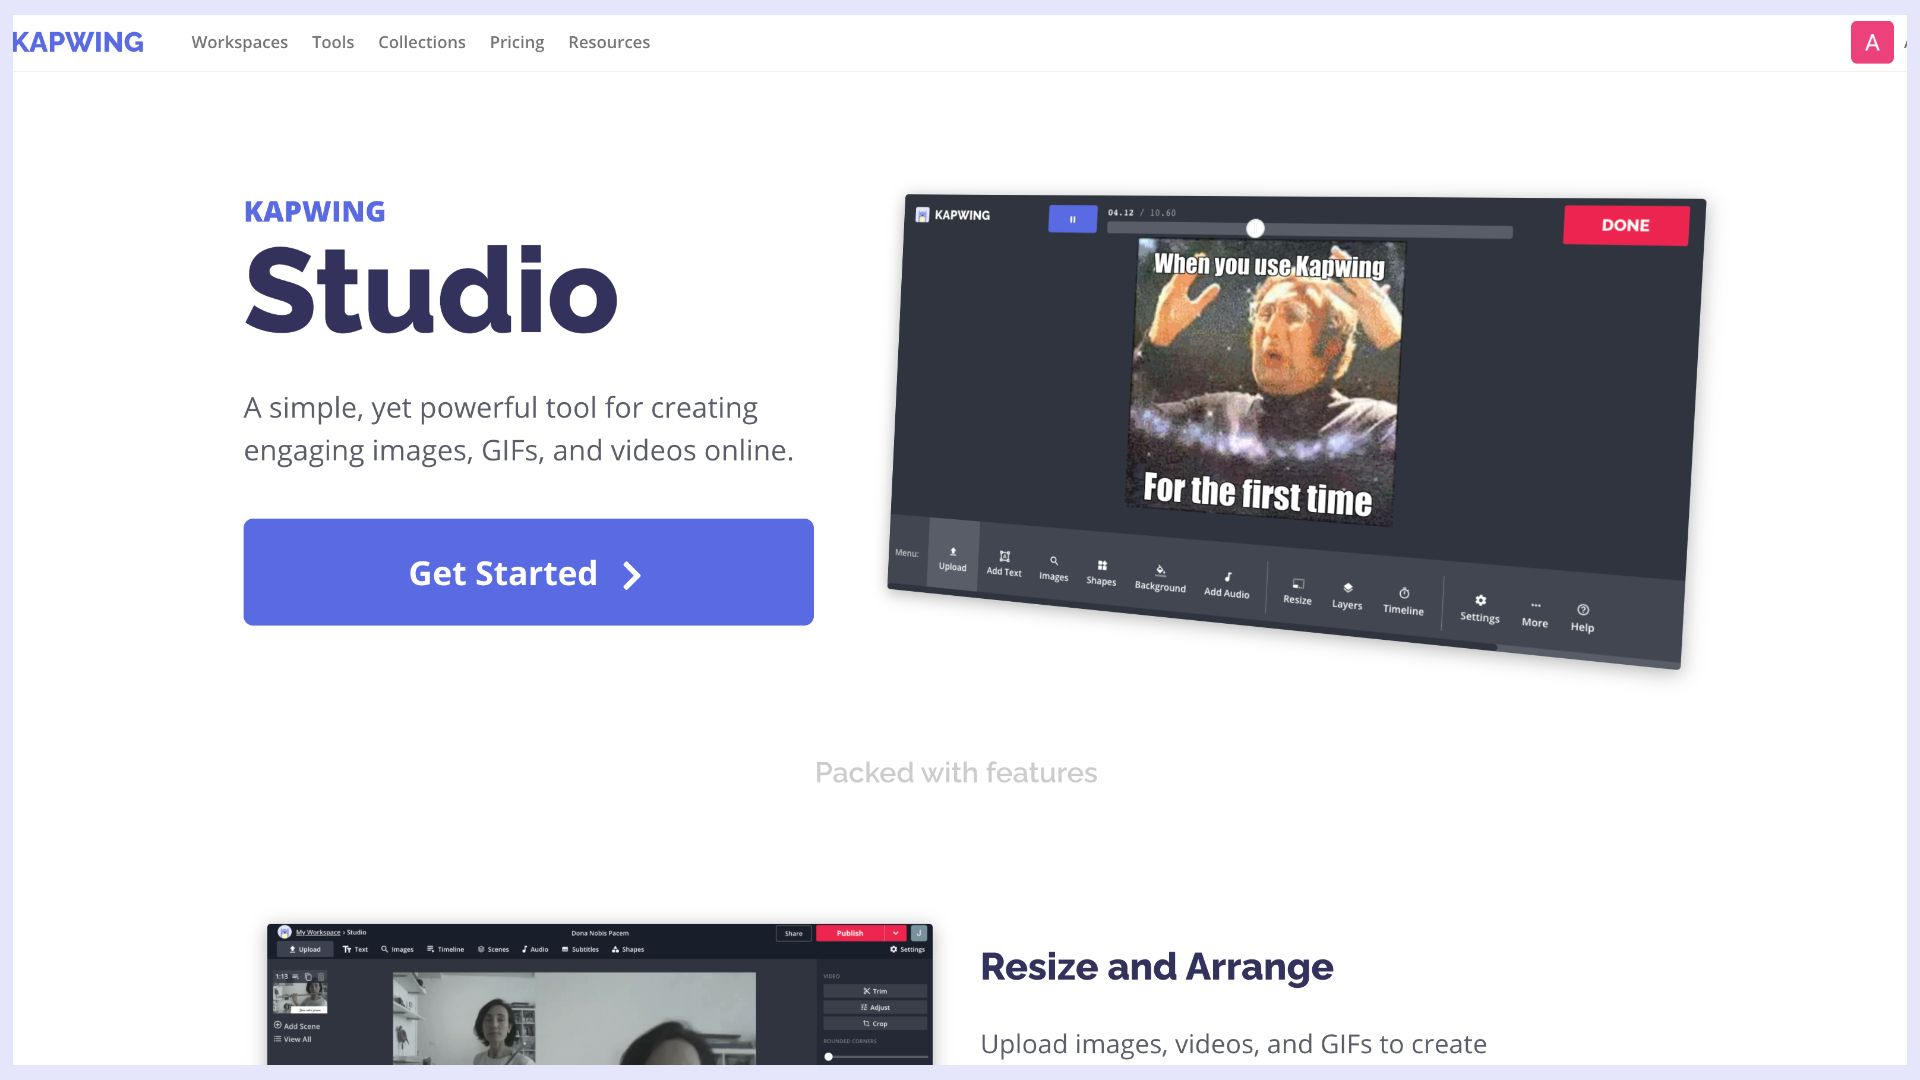 a screenshot of kapwing studio